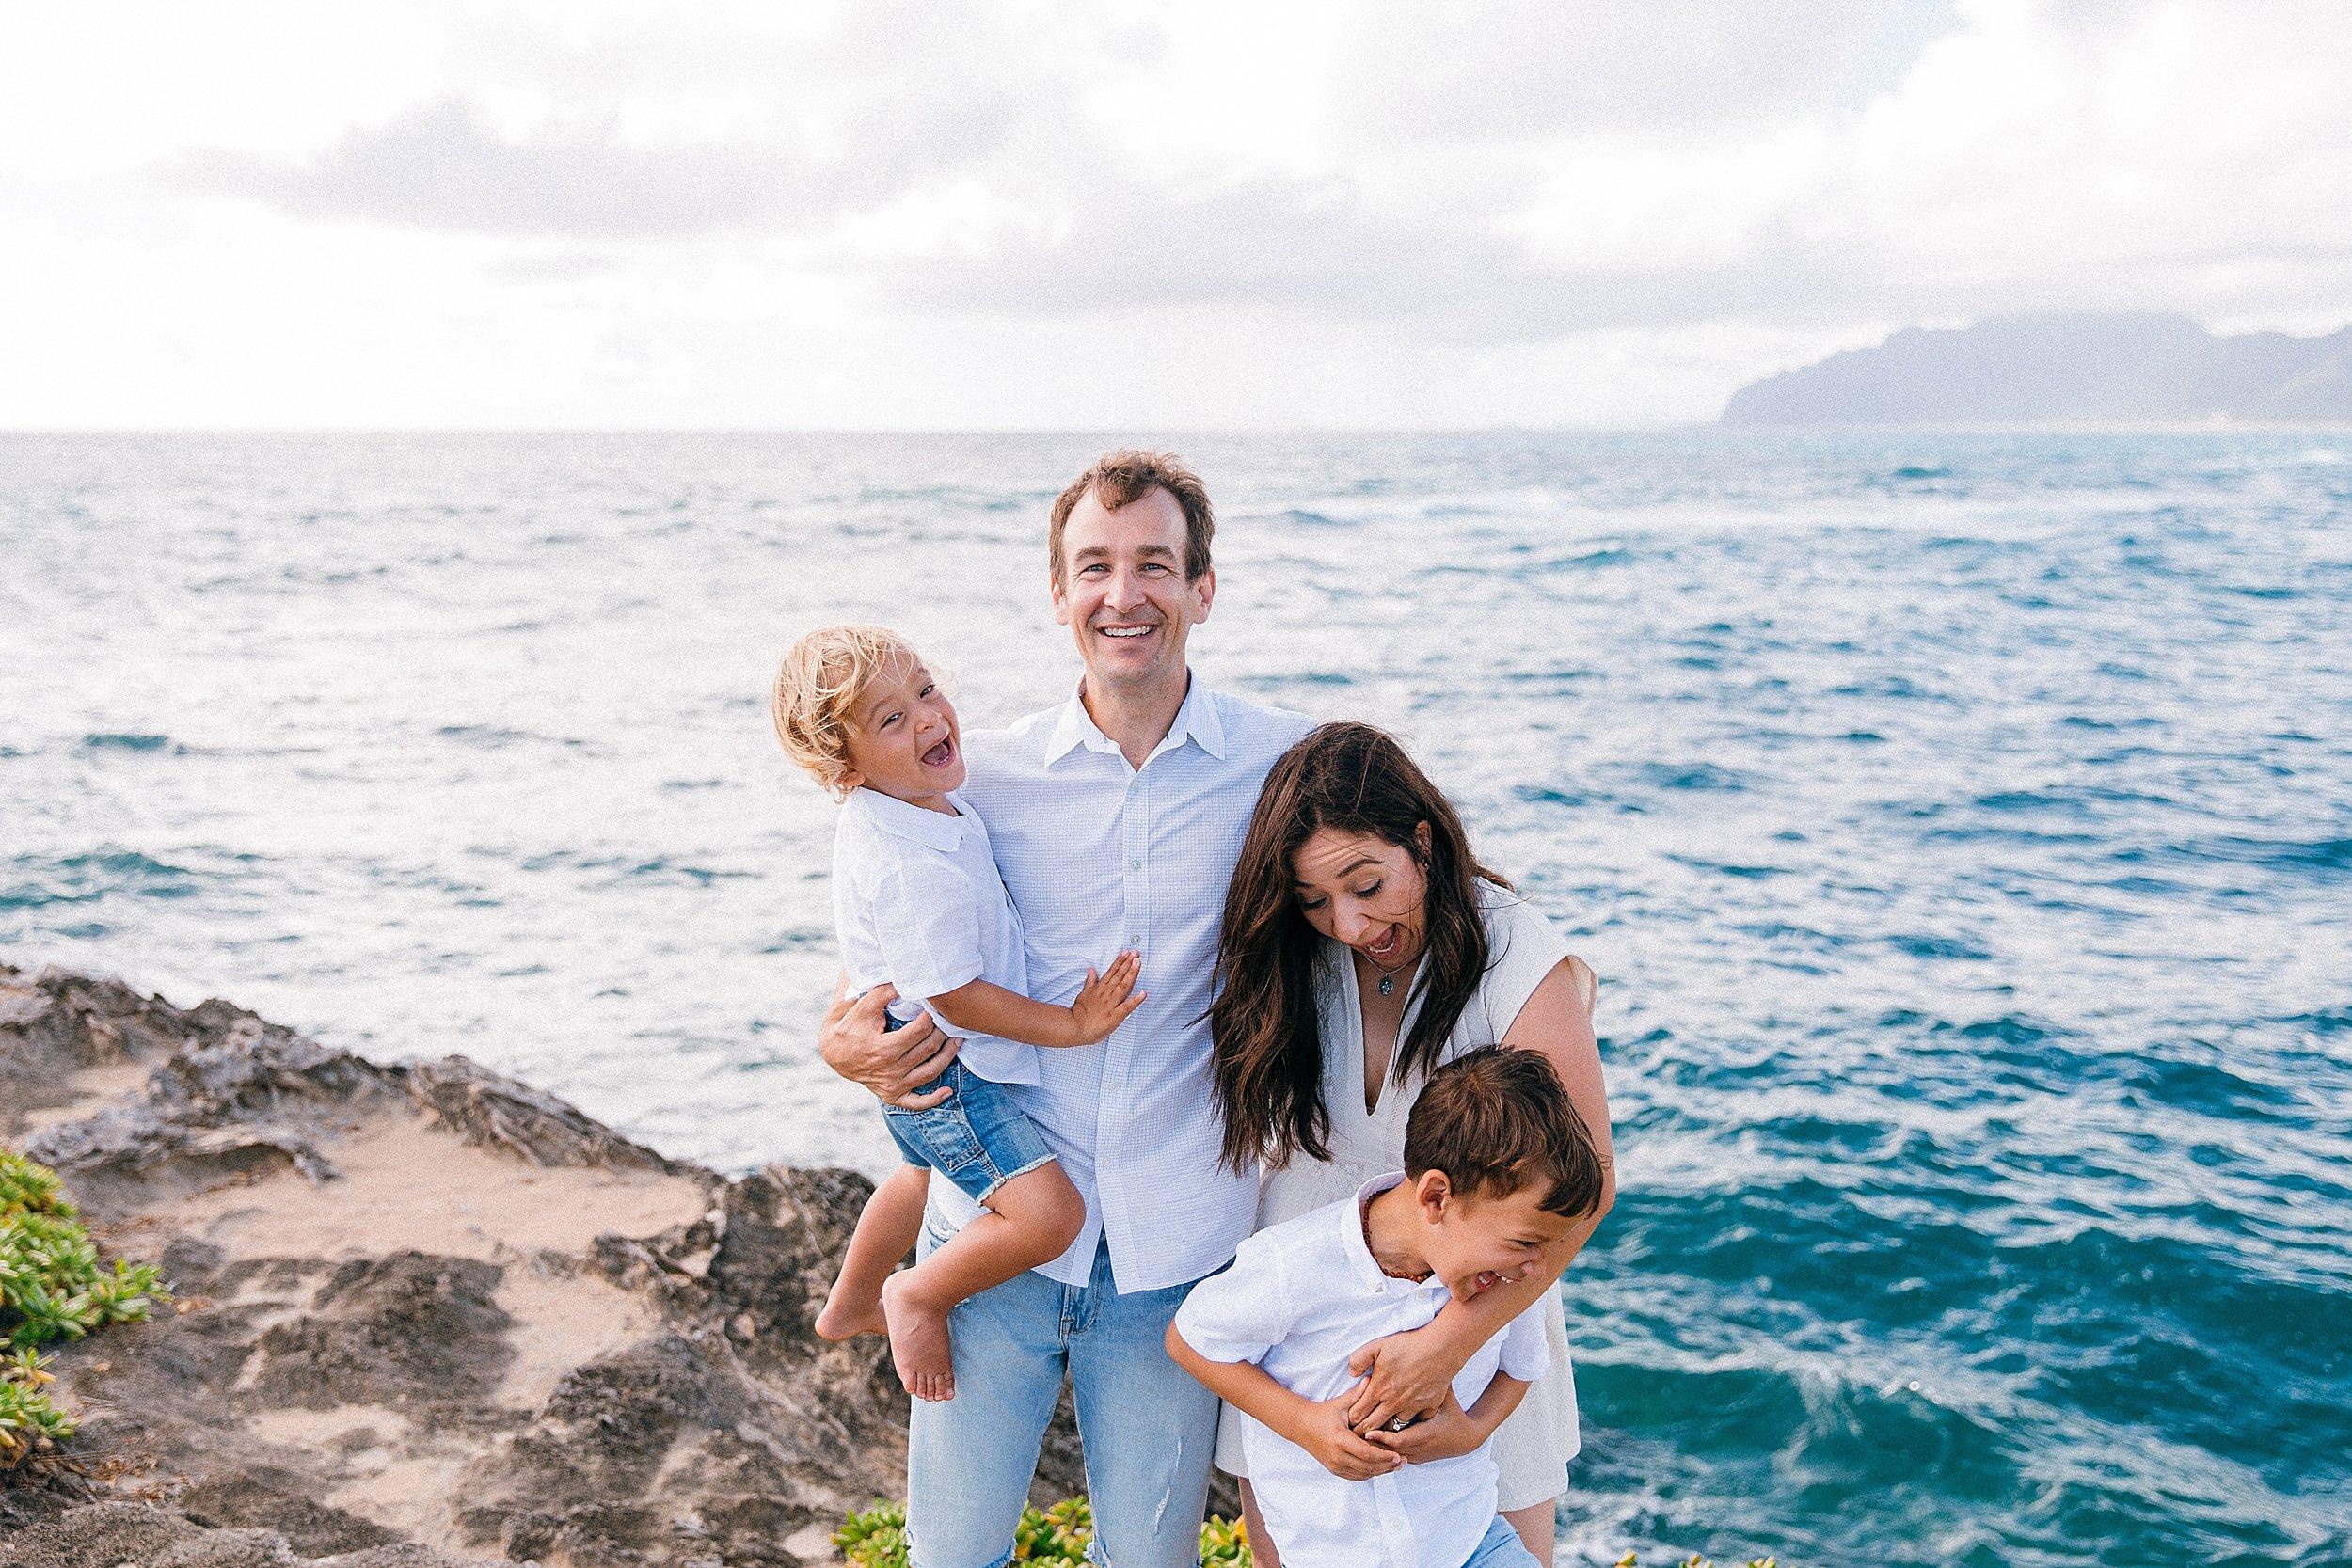 honolulu-north-shore-hawaii-vacation-photographs_0052.jpg